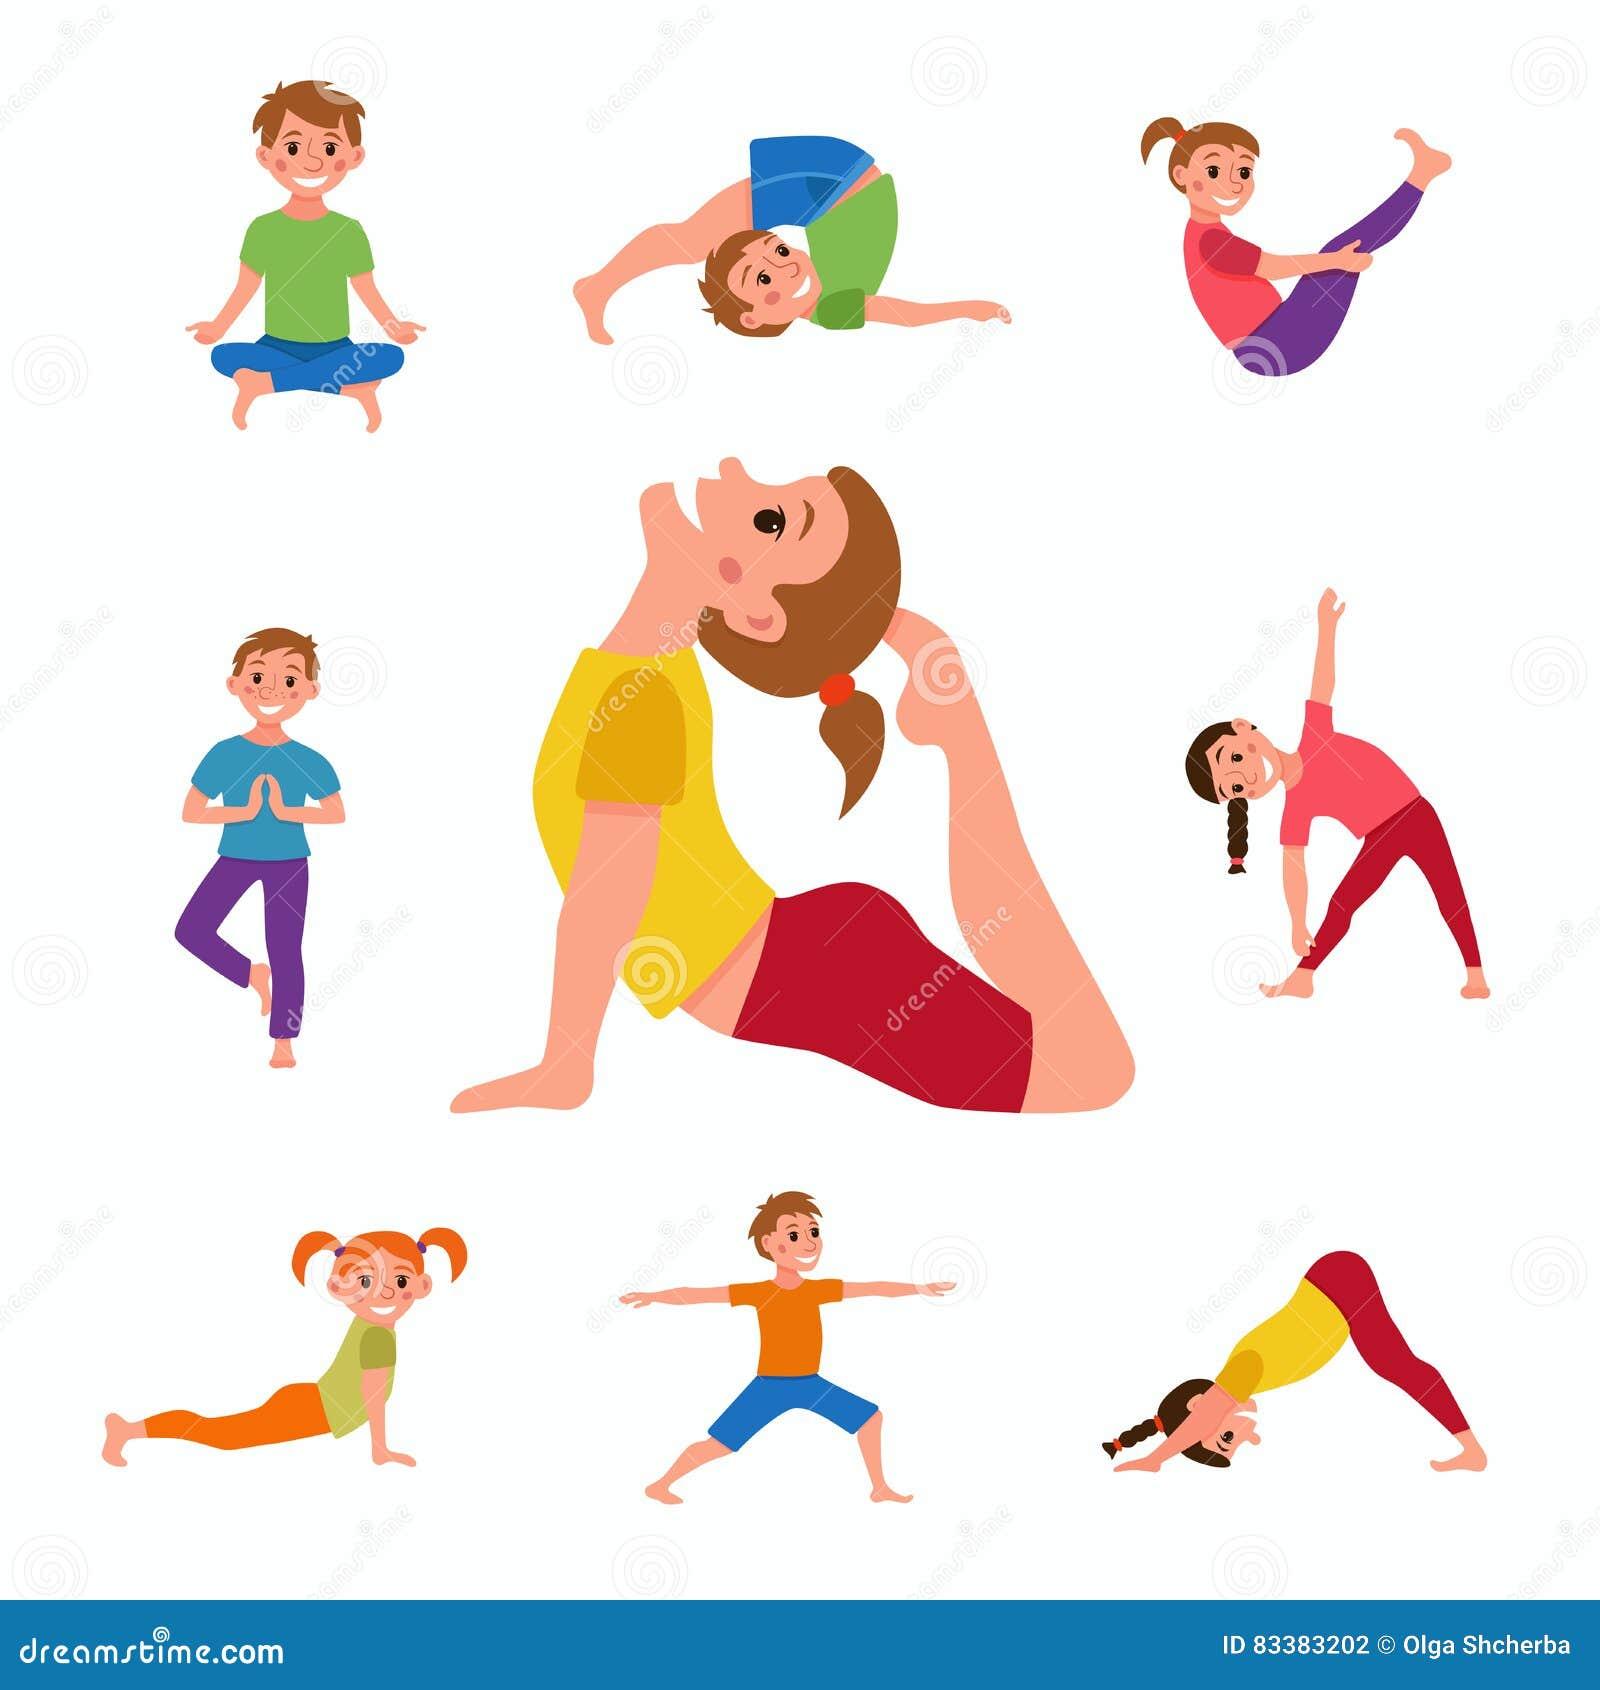 clip art gymnastics poses - photo #26